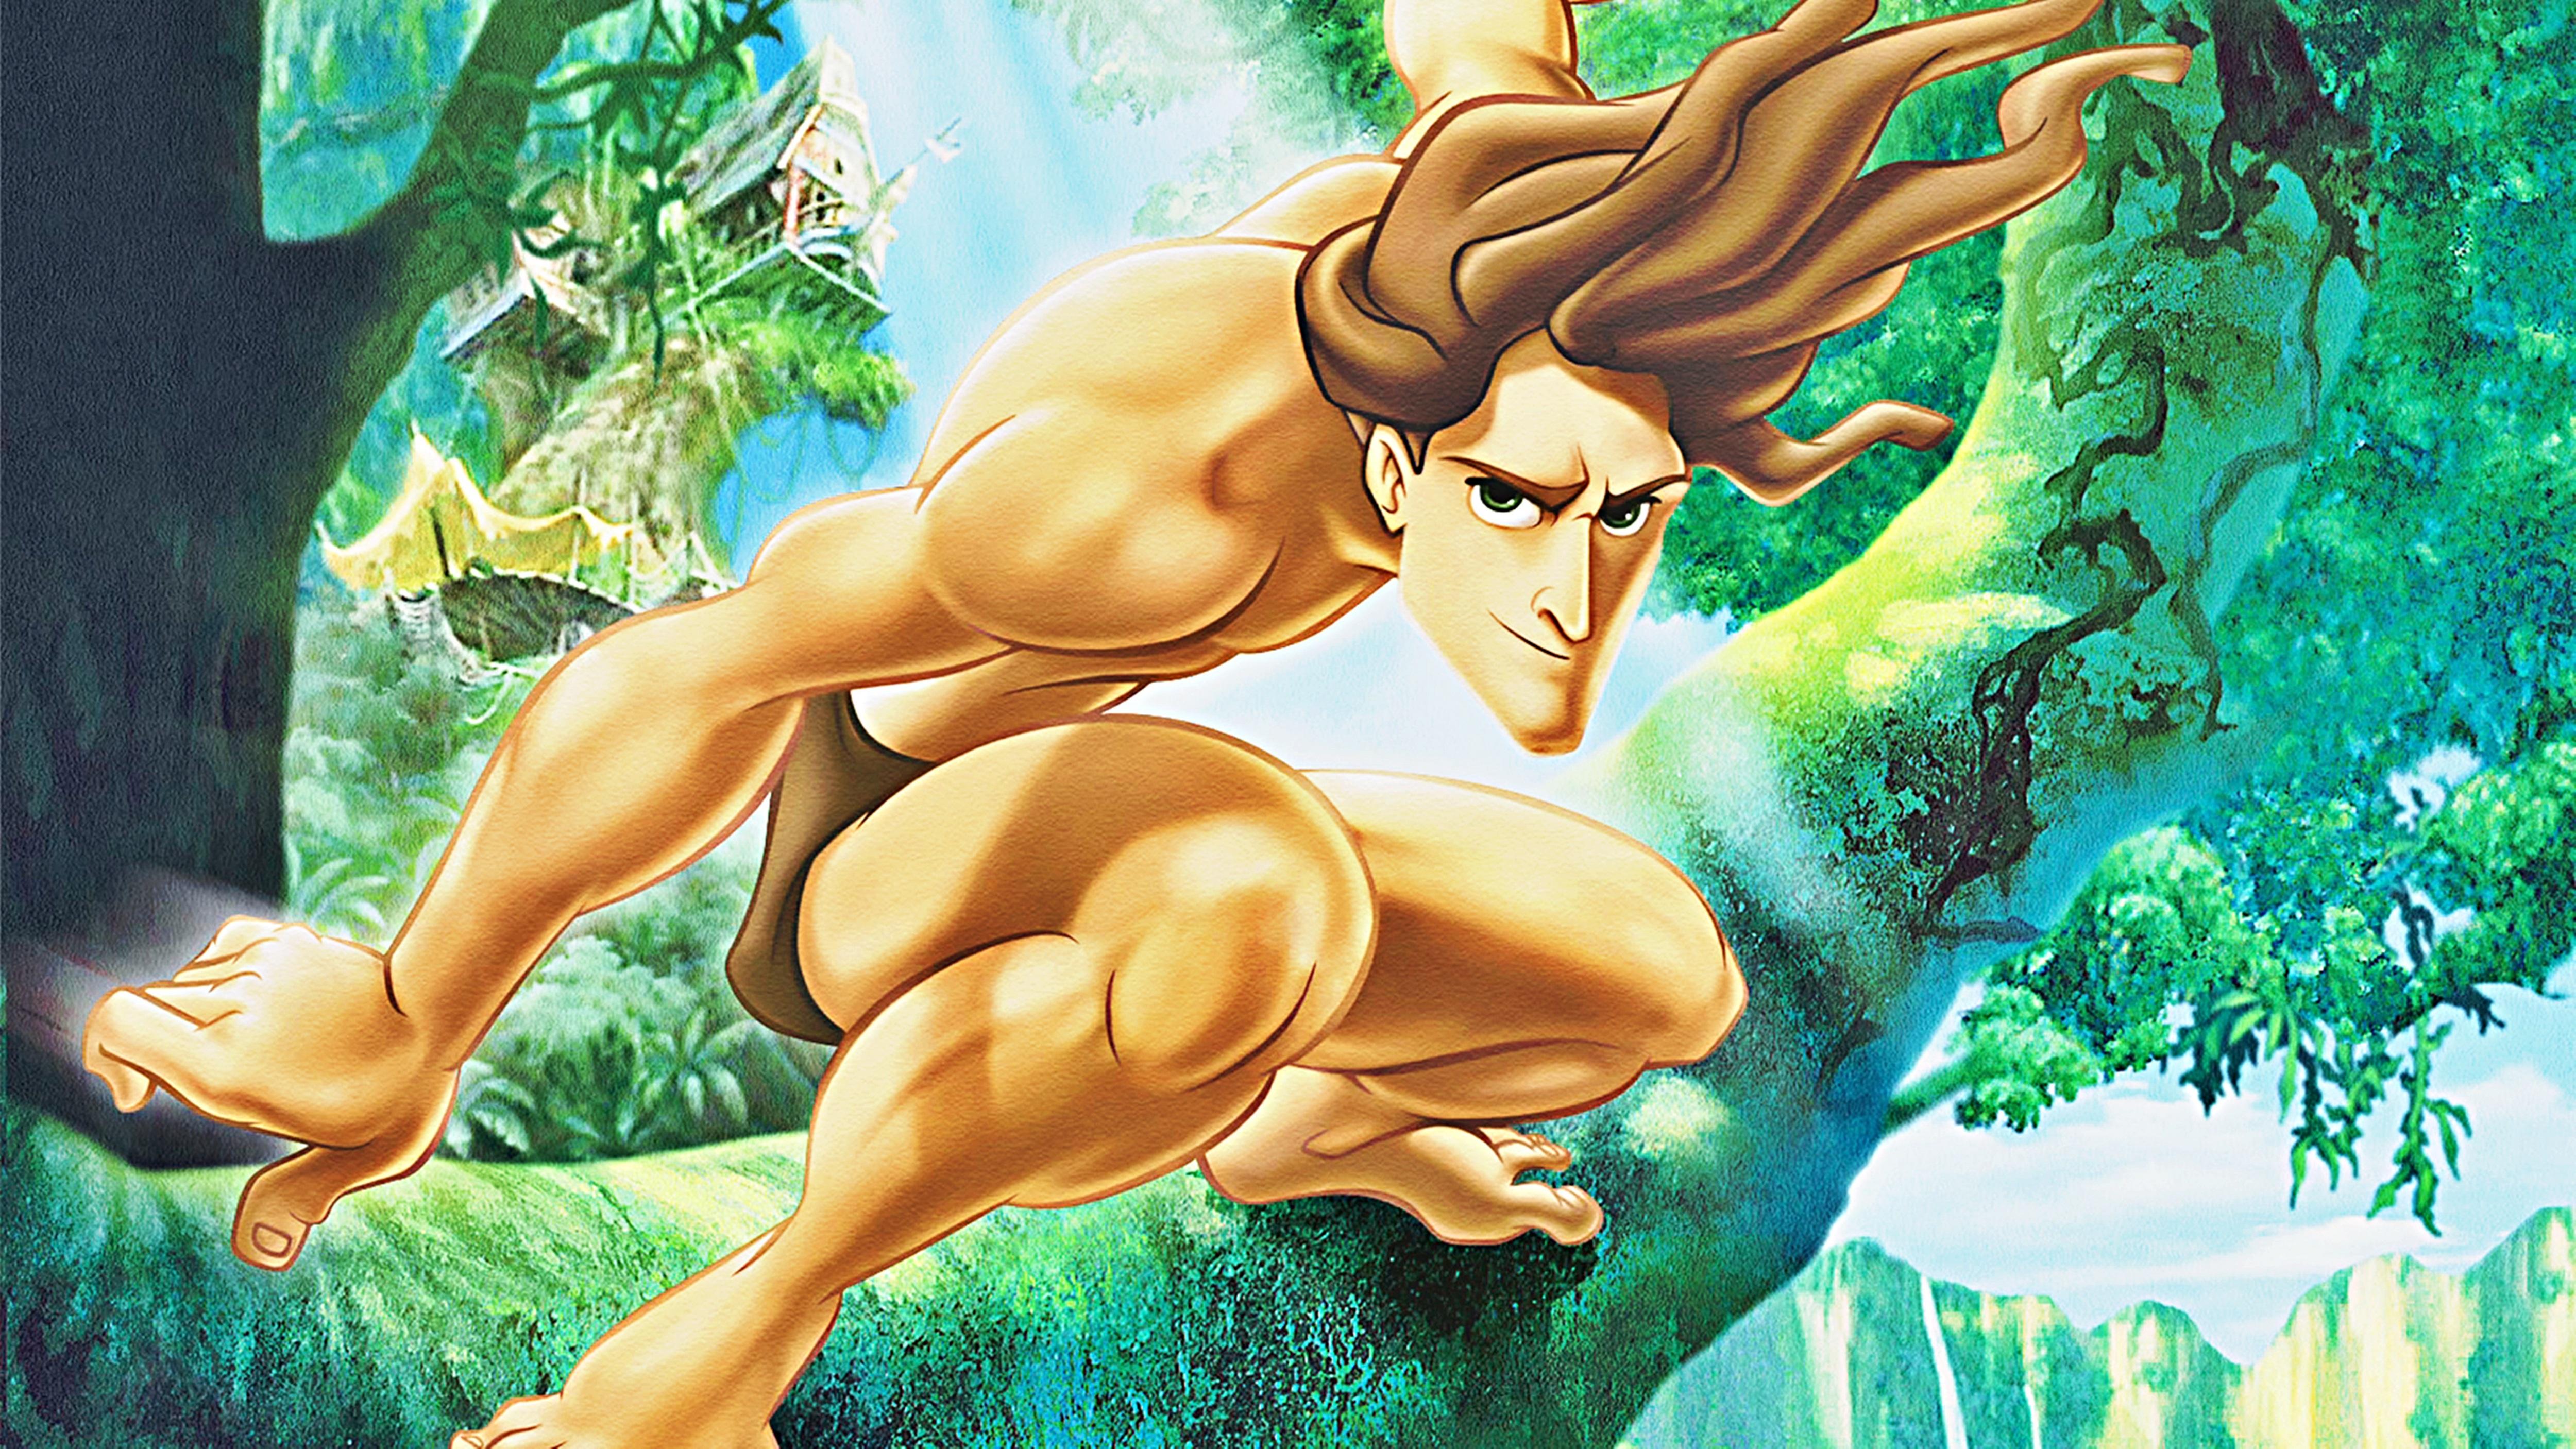 Walt Disney Wallpapers   Tarzan   Walt Disney Characters Wallpaper 5000x2813